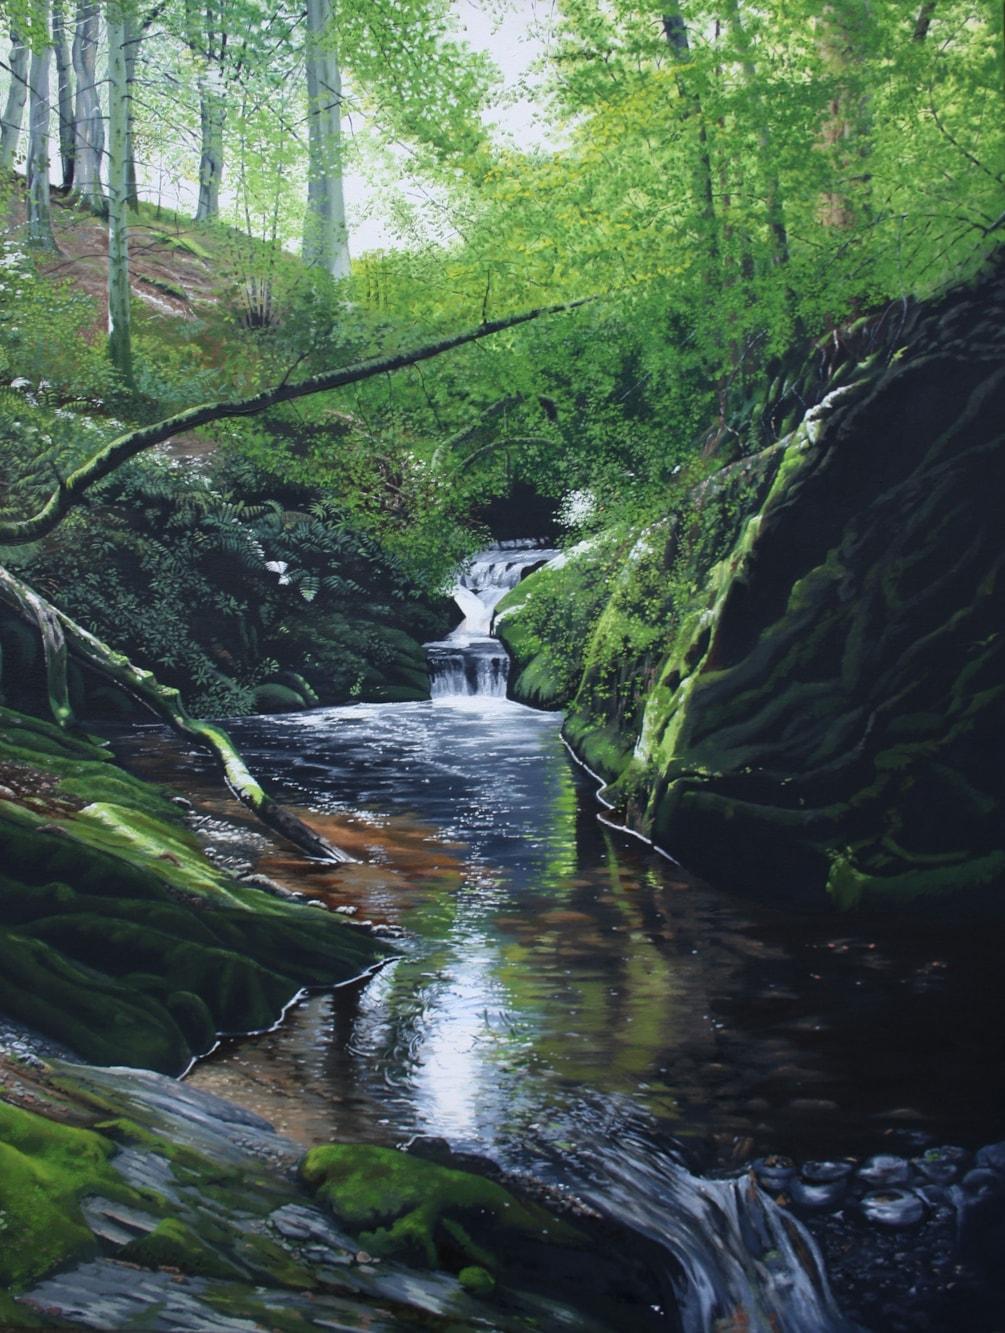 Secluded waterfall, Nant Methan, Elan Valley